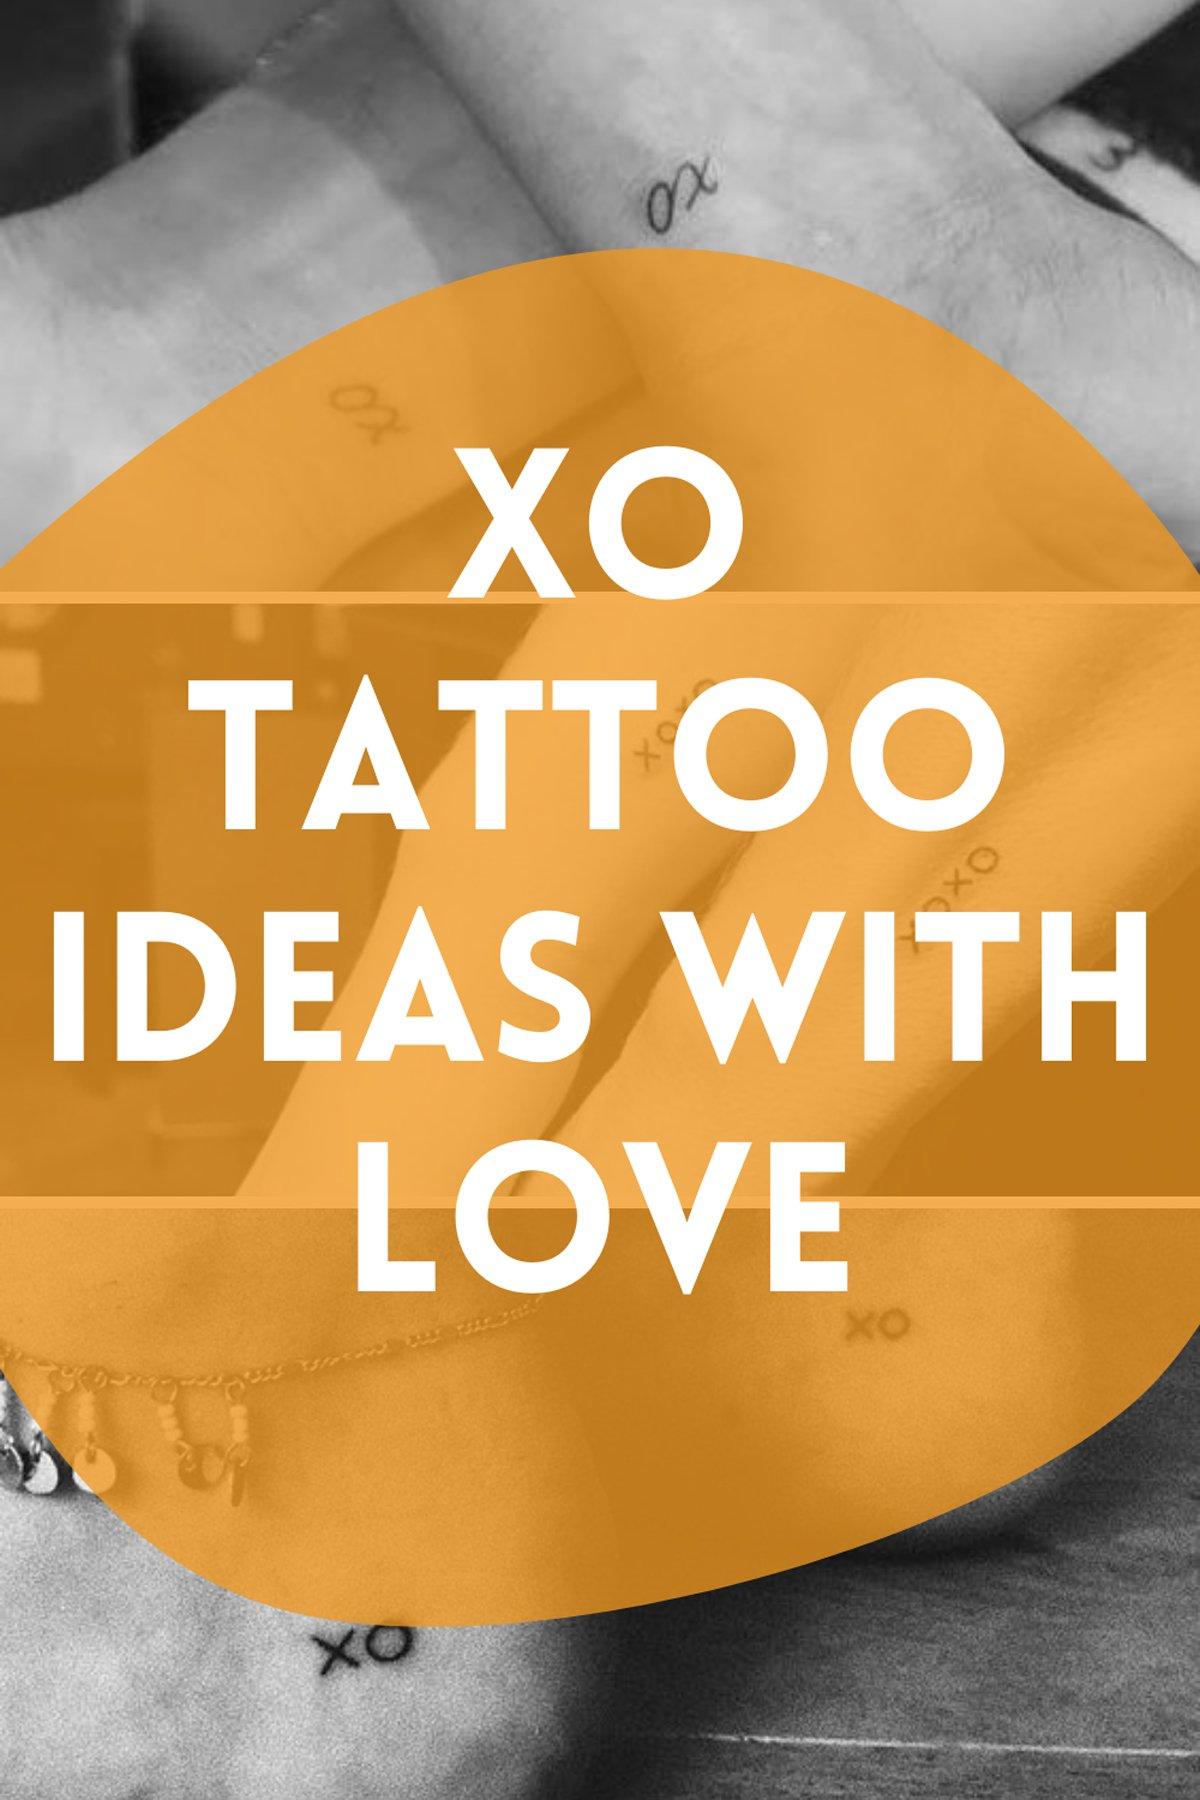 Love Tattoos Matching